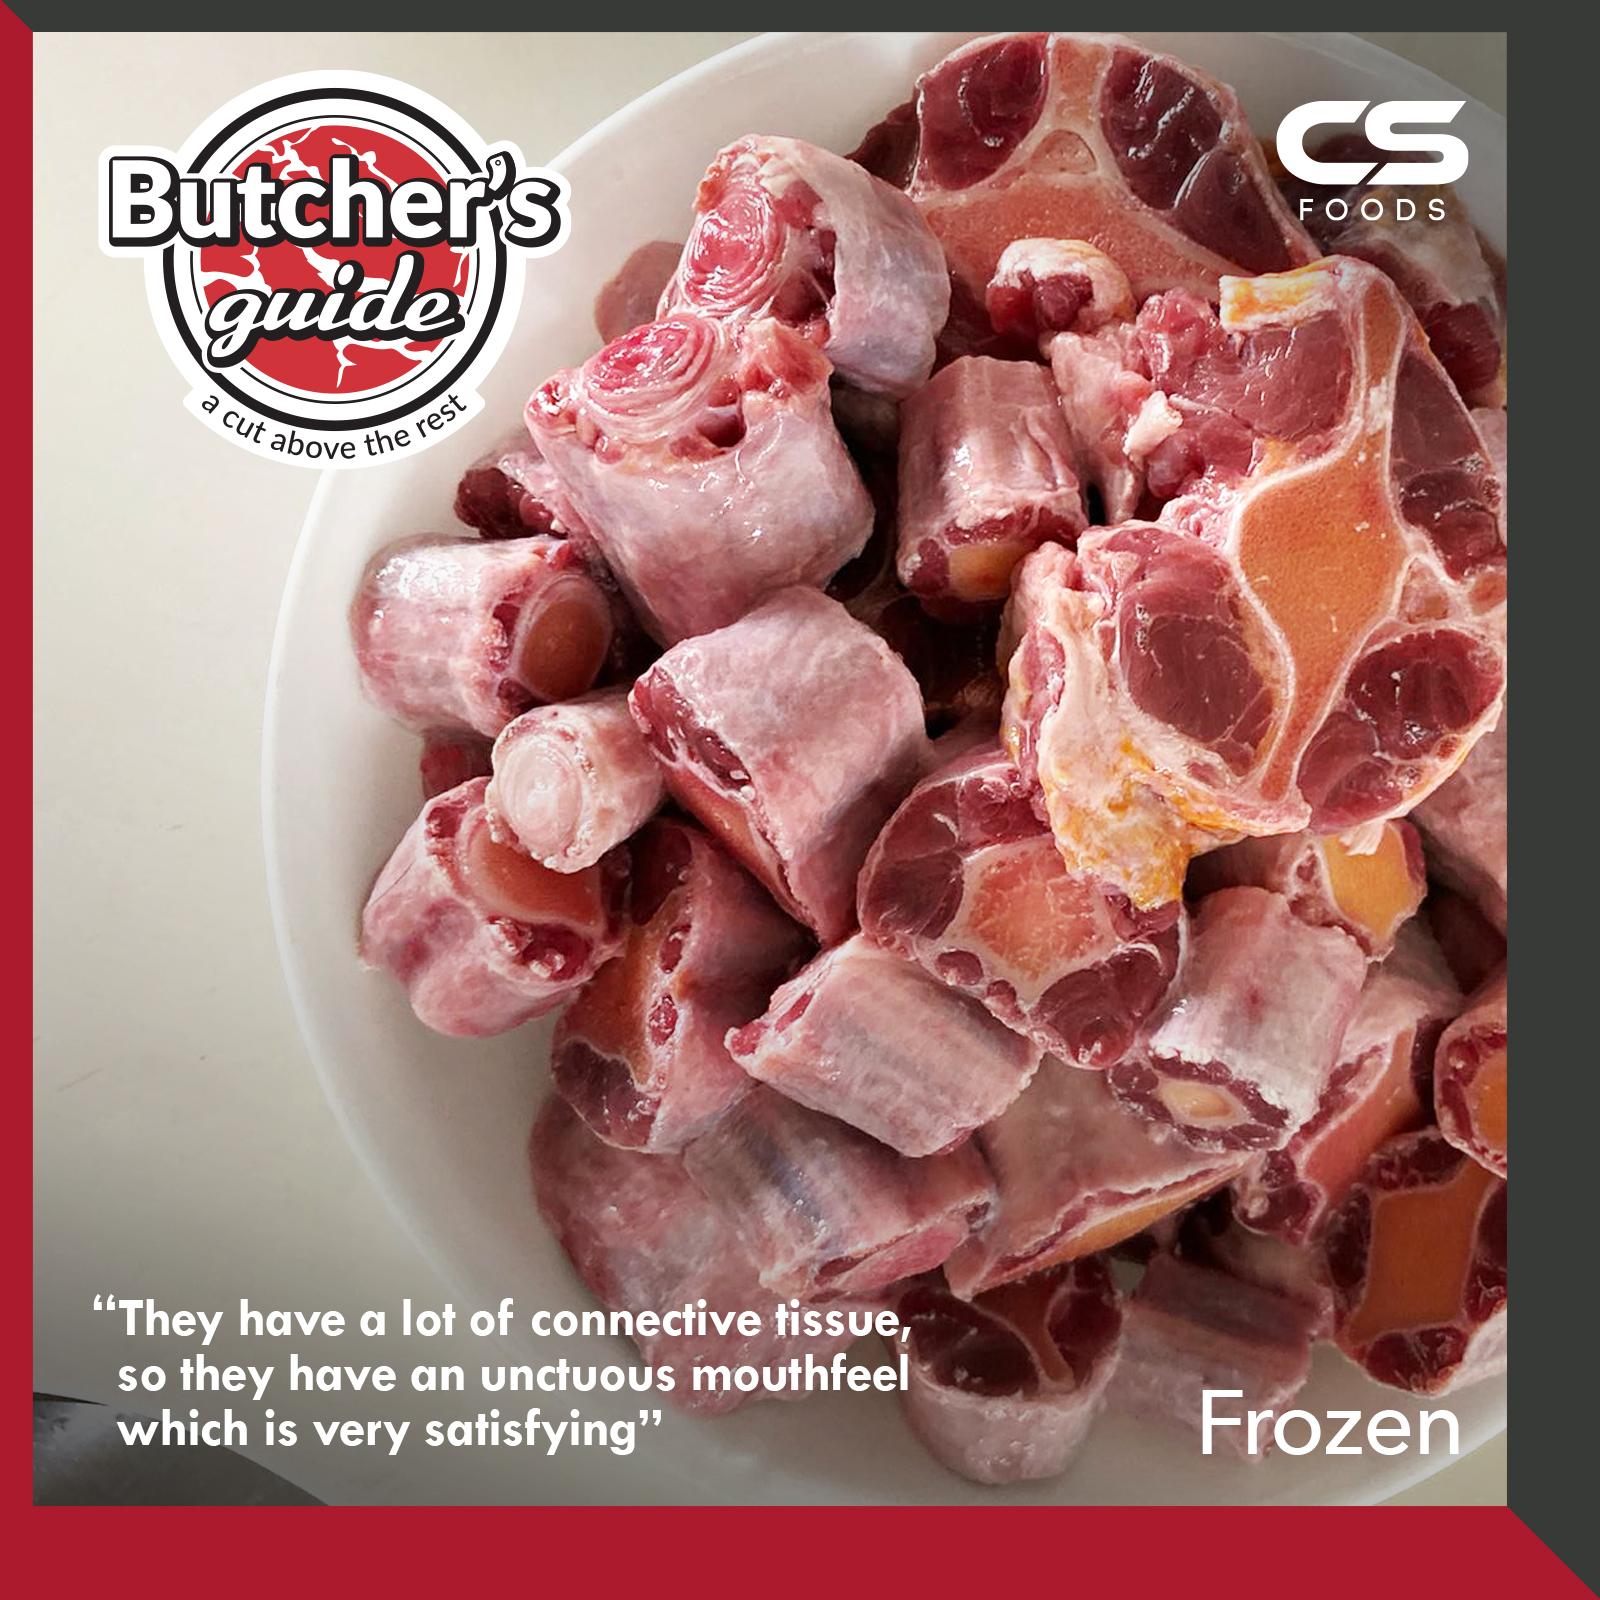 85)CS_Butcher_s-Guide-Ox-Tail-Cut-1_-500